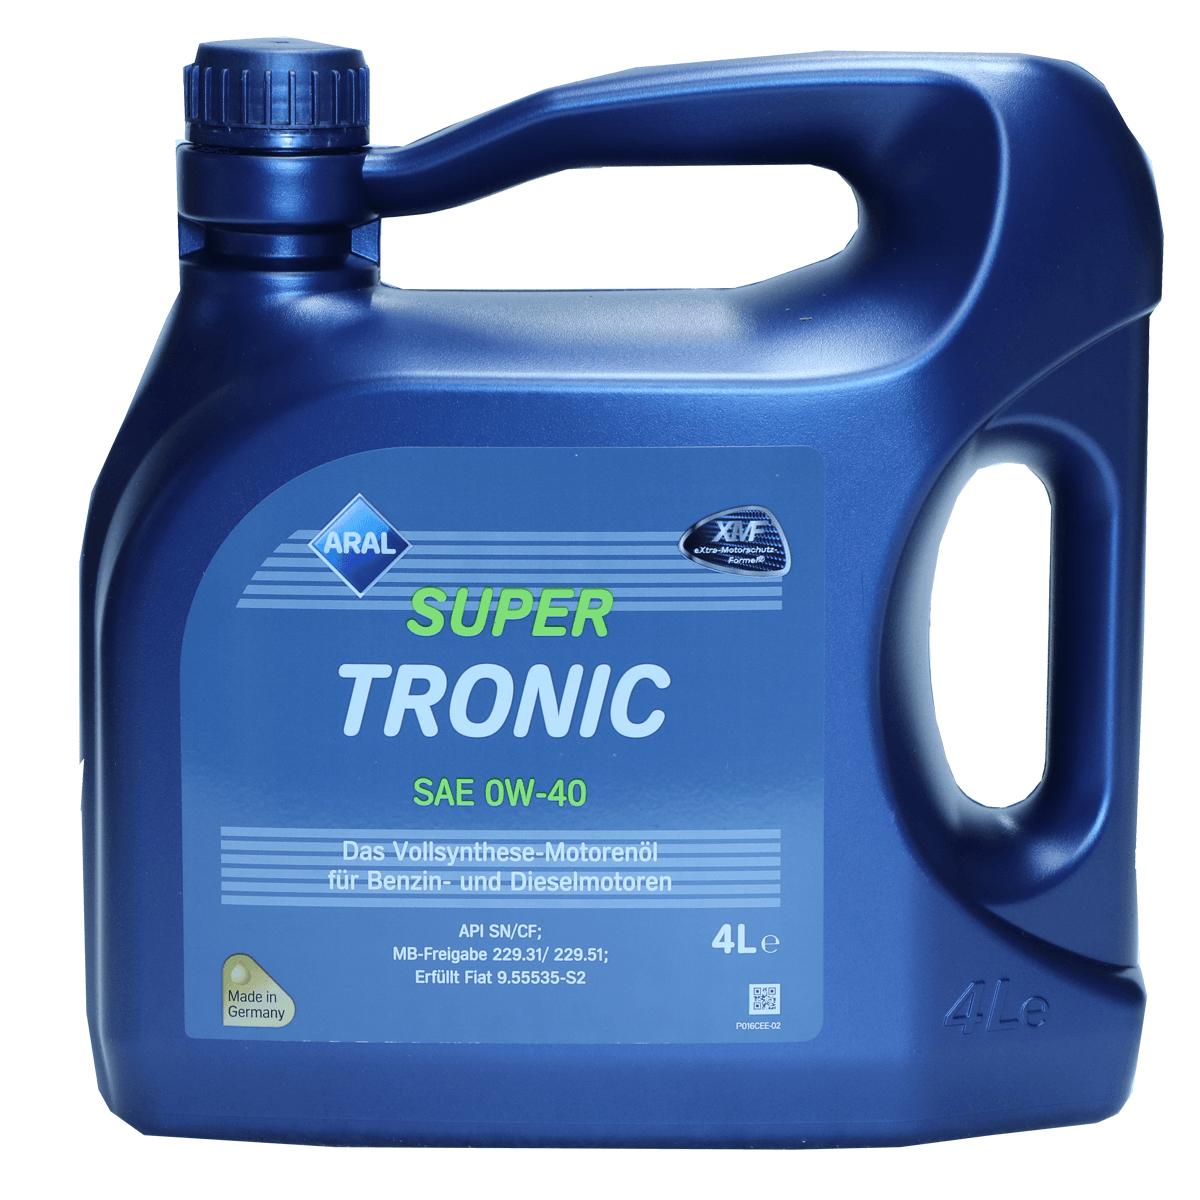 Aral SuperTronic 0W-40 Motoröl, 4l